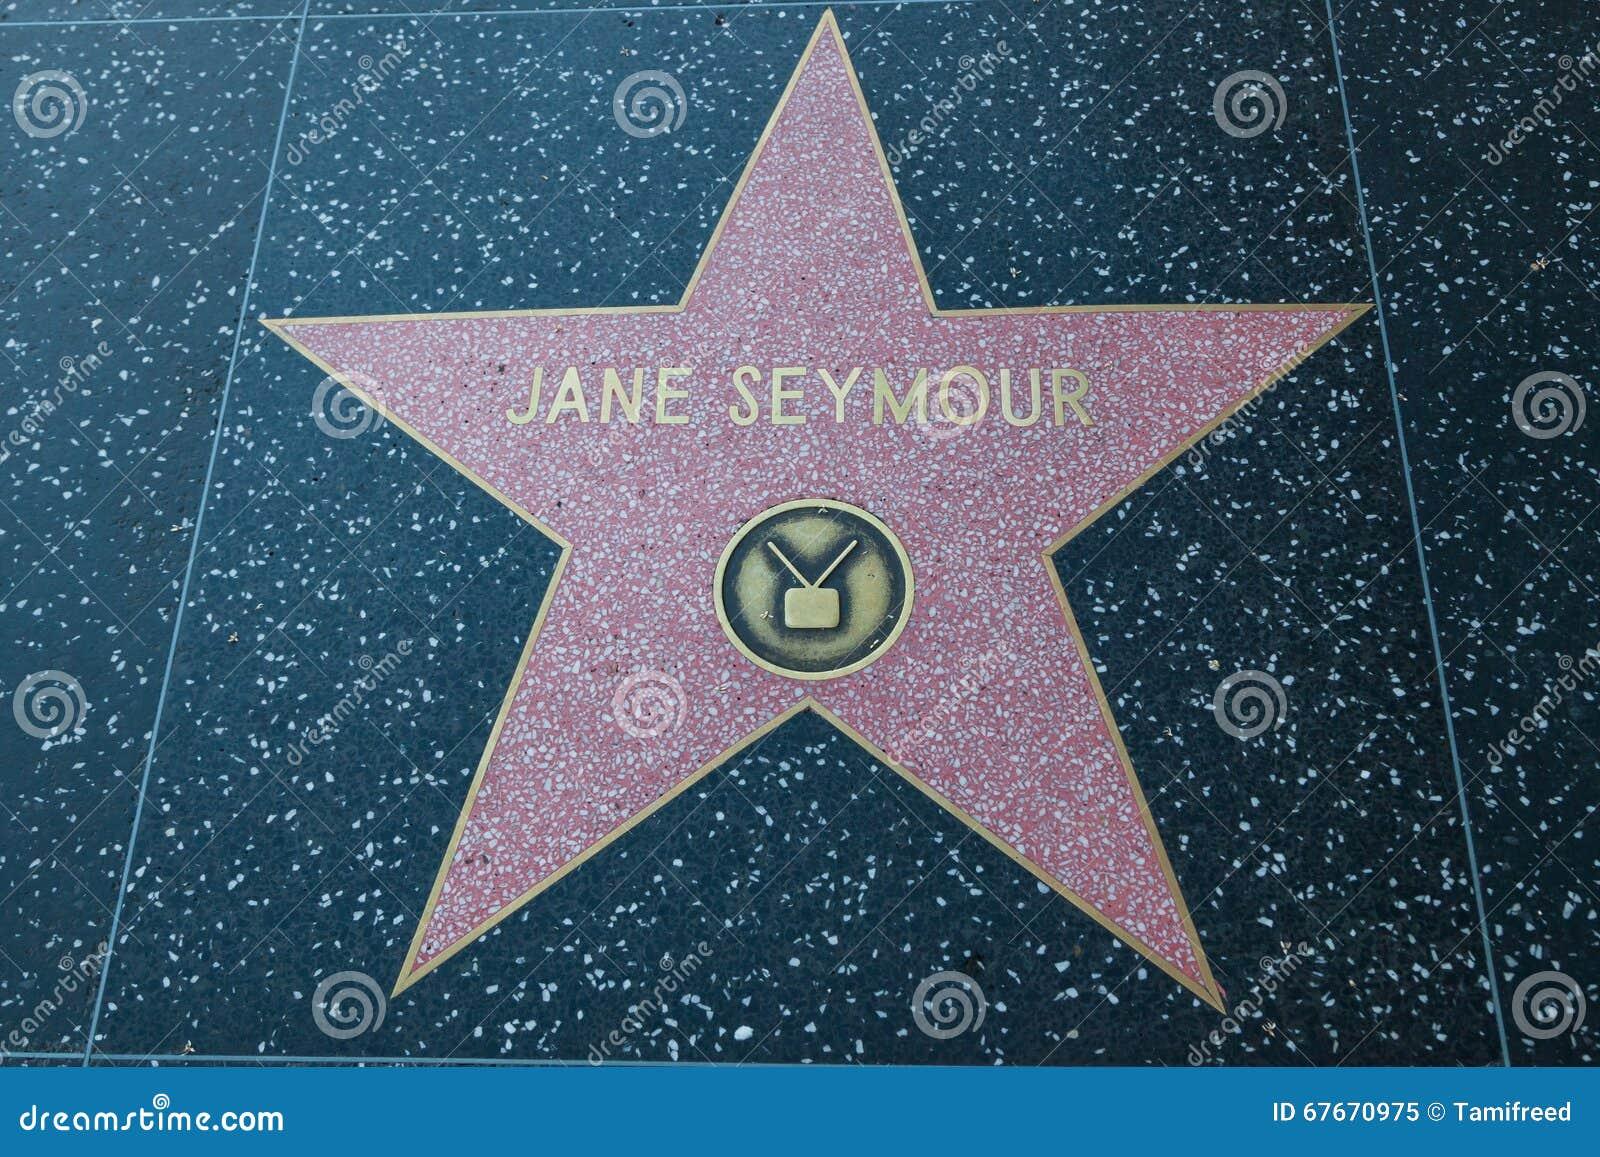 Jane Seymour Hollywood Star